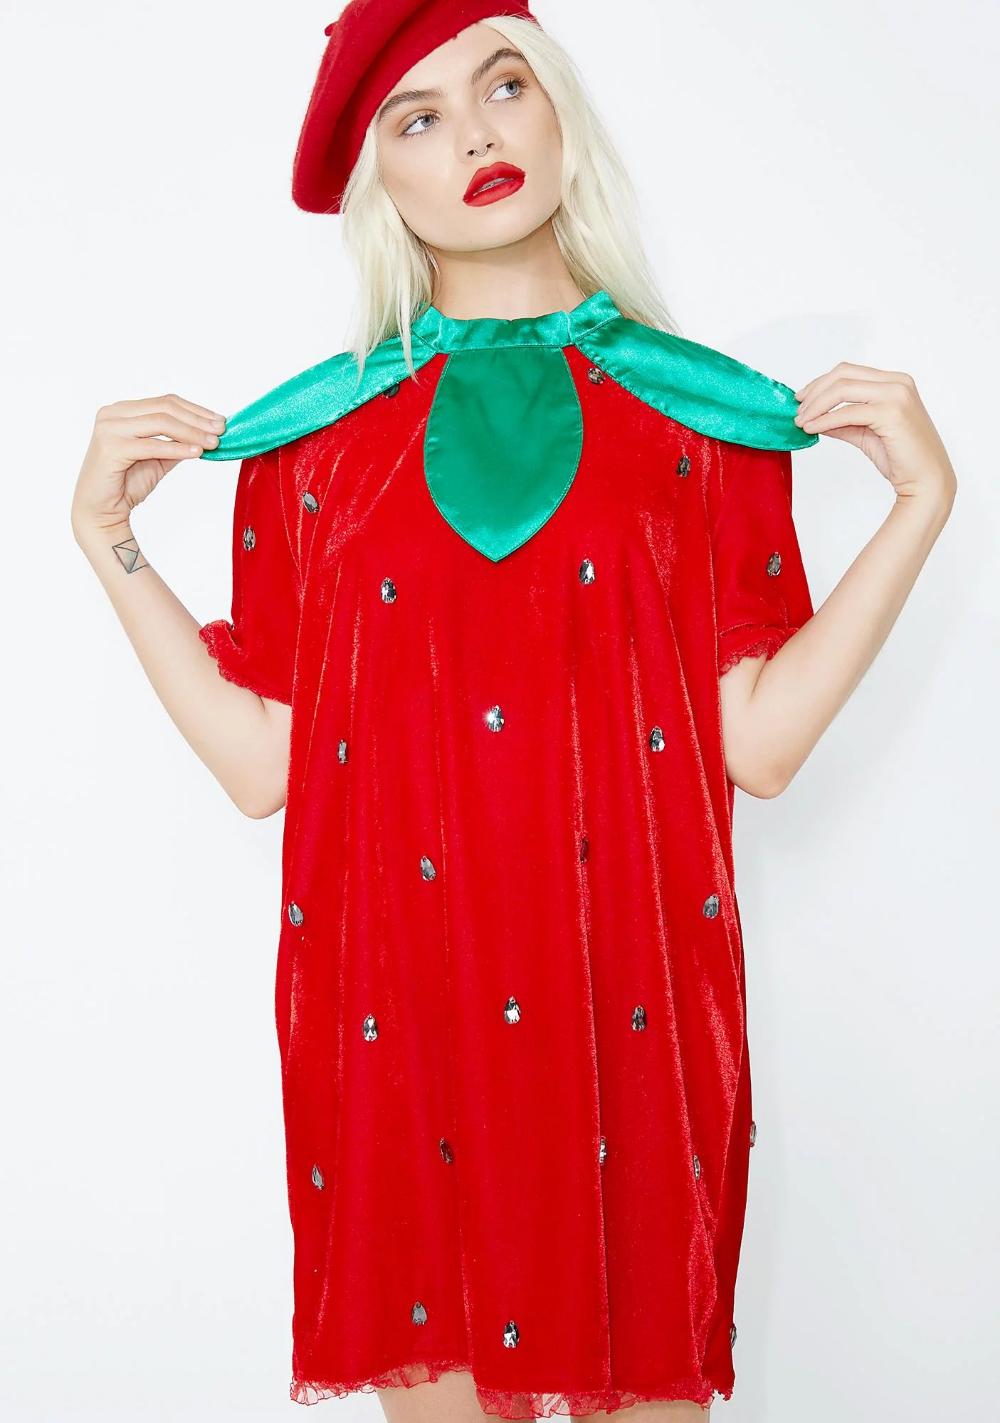 Berry Delicious Strawberry Costume in 2020 Strawberry